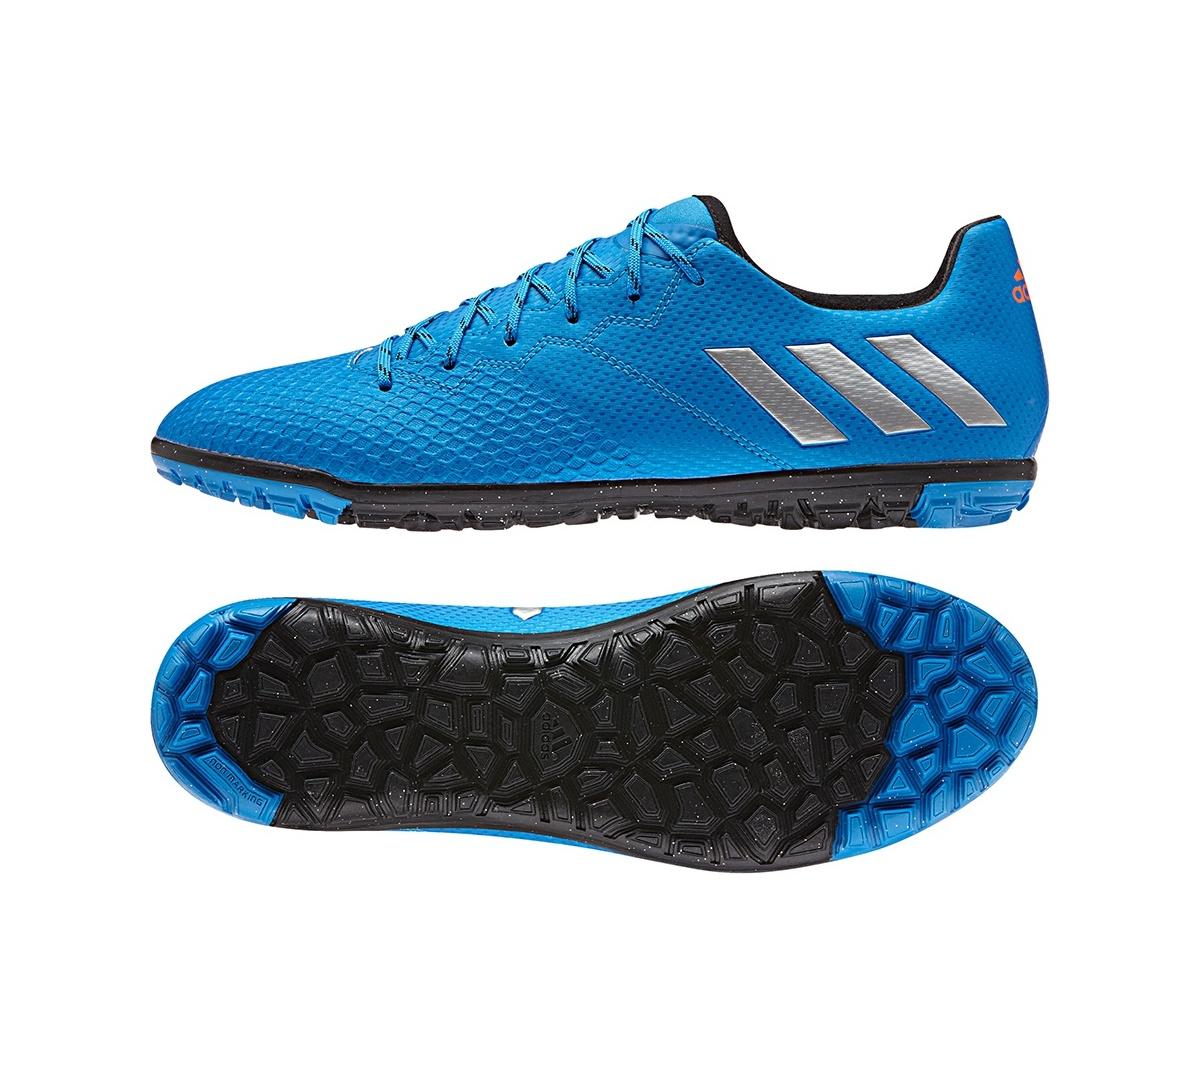 Chuteira Adidas Messi 16.3 Society Azul Royal - Mundo do Futebol 10658b43b5dba